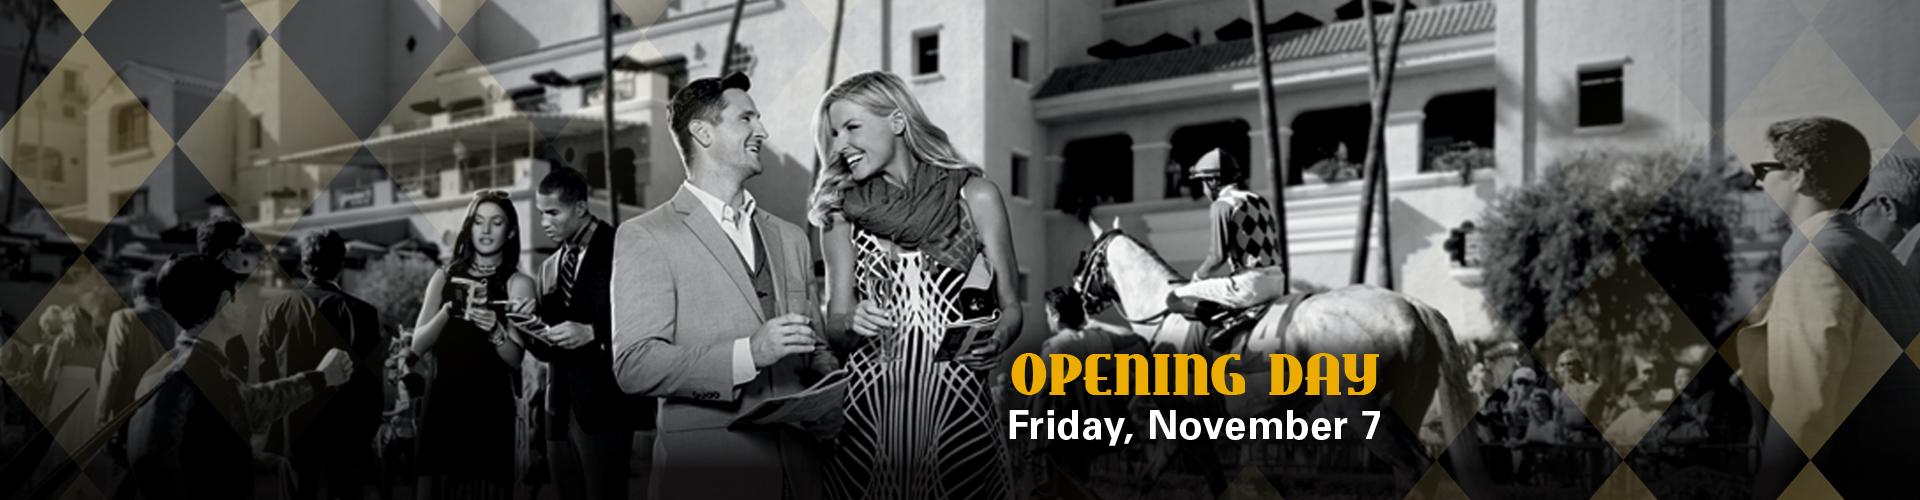 Bing Crosby Opening Day Del Mar Novemeber